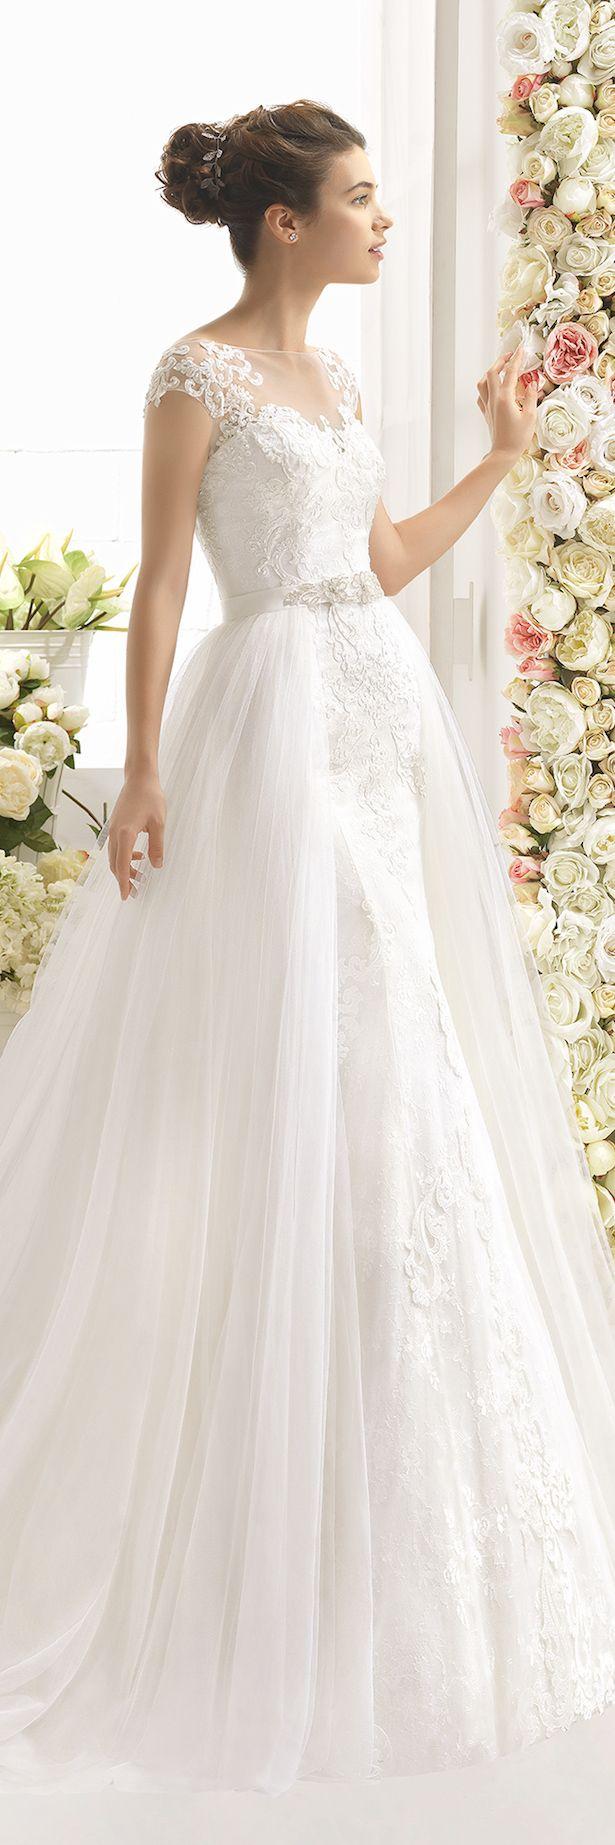 Wedding-Dresses-0969